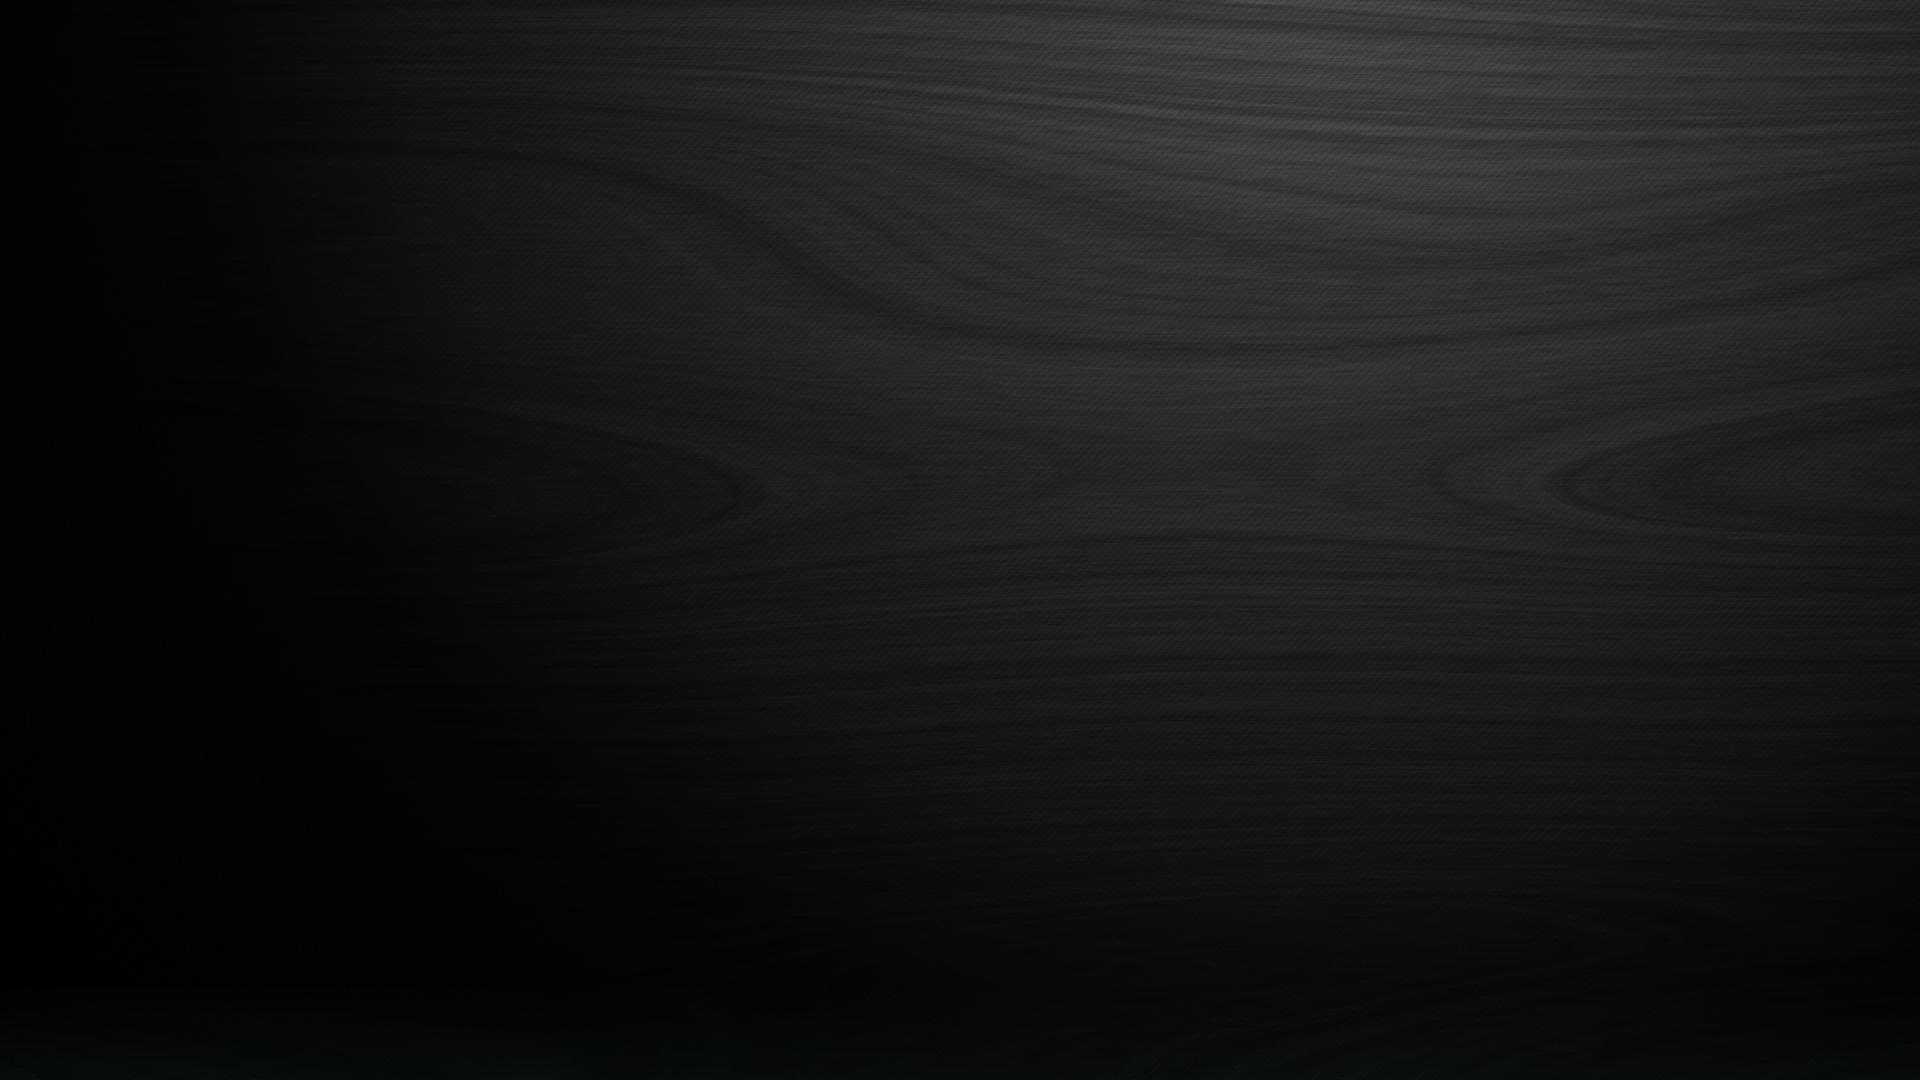 Free Download Black Texture 52 Hd Black White Wallpaper Download Download Black 1920x1080 For Your Desktop Mobile Tablet Explore 78 Cool Black Wallpaper Black Pc Wallpaper Cool Black Wallpaper